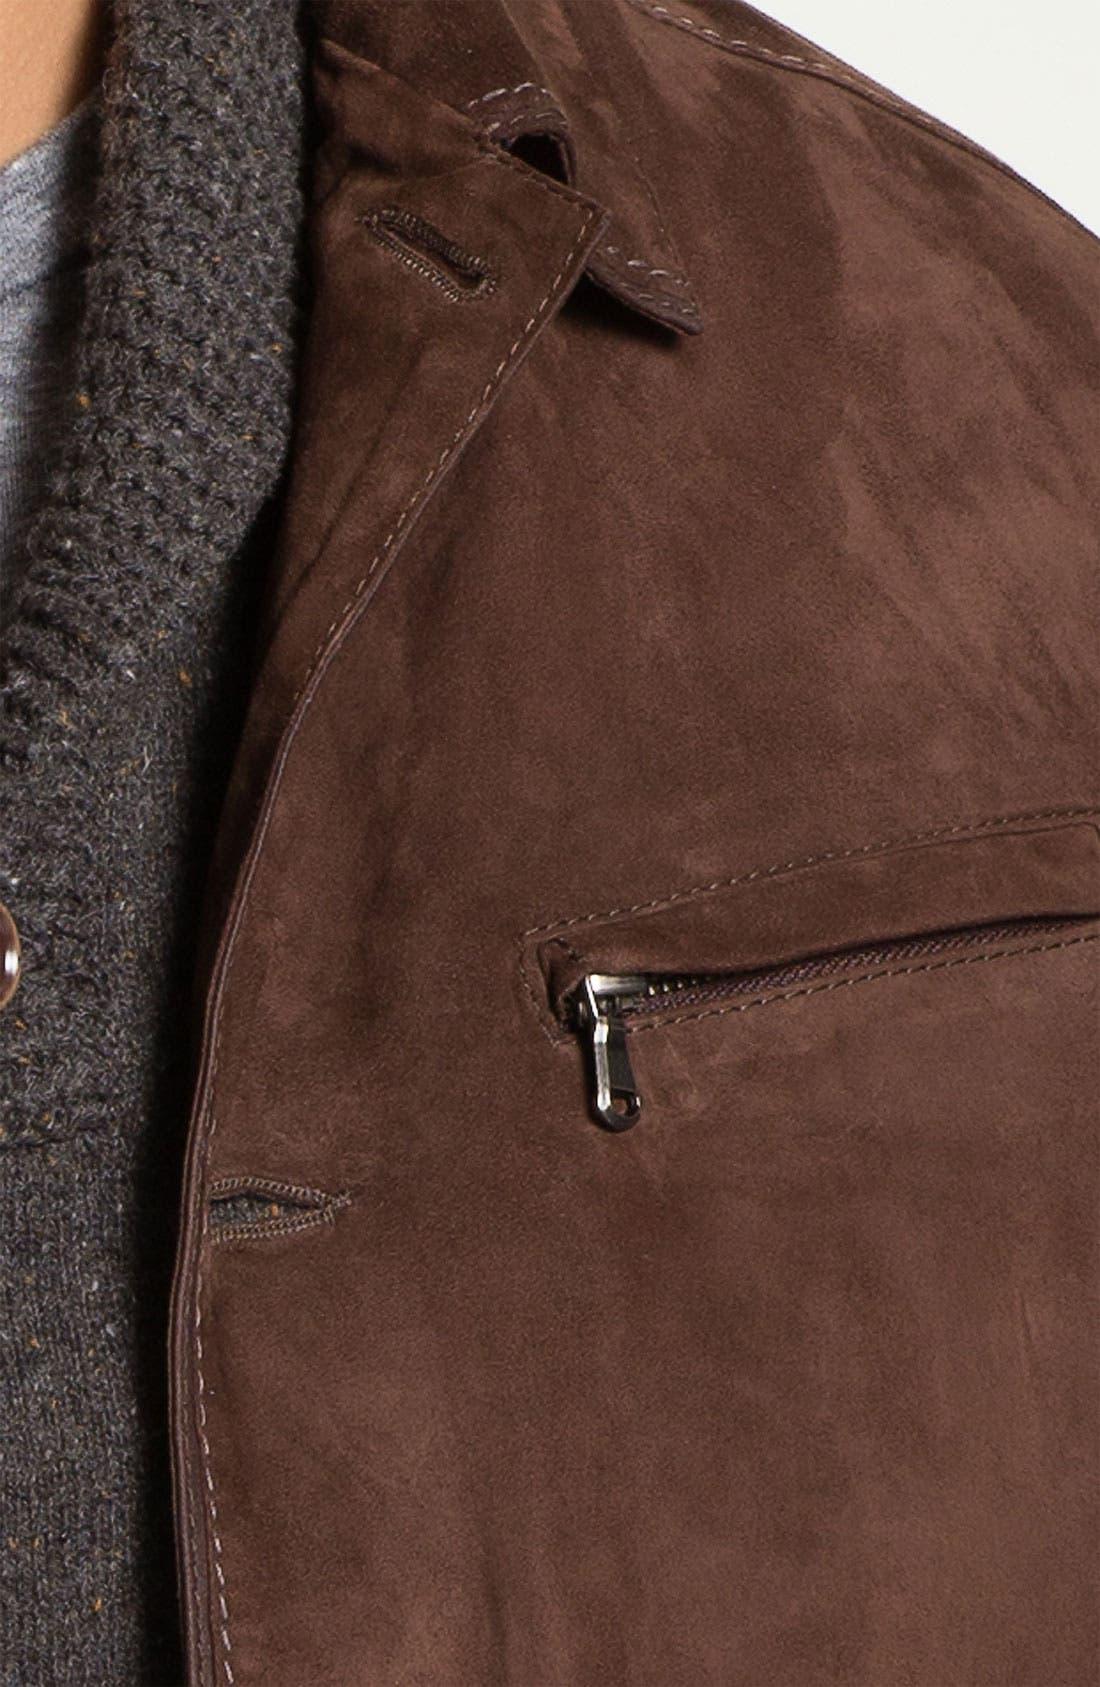 Goatskin Suede Jacket,                             Alternate thumbnail 2, color,                             200